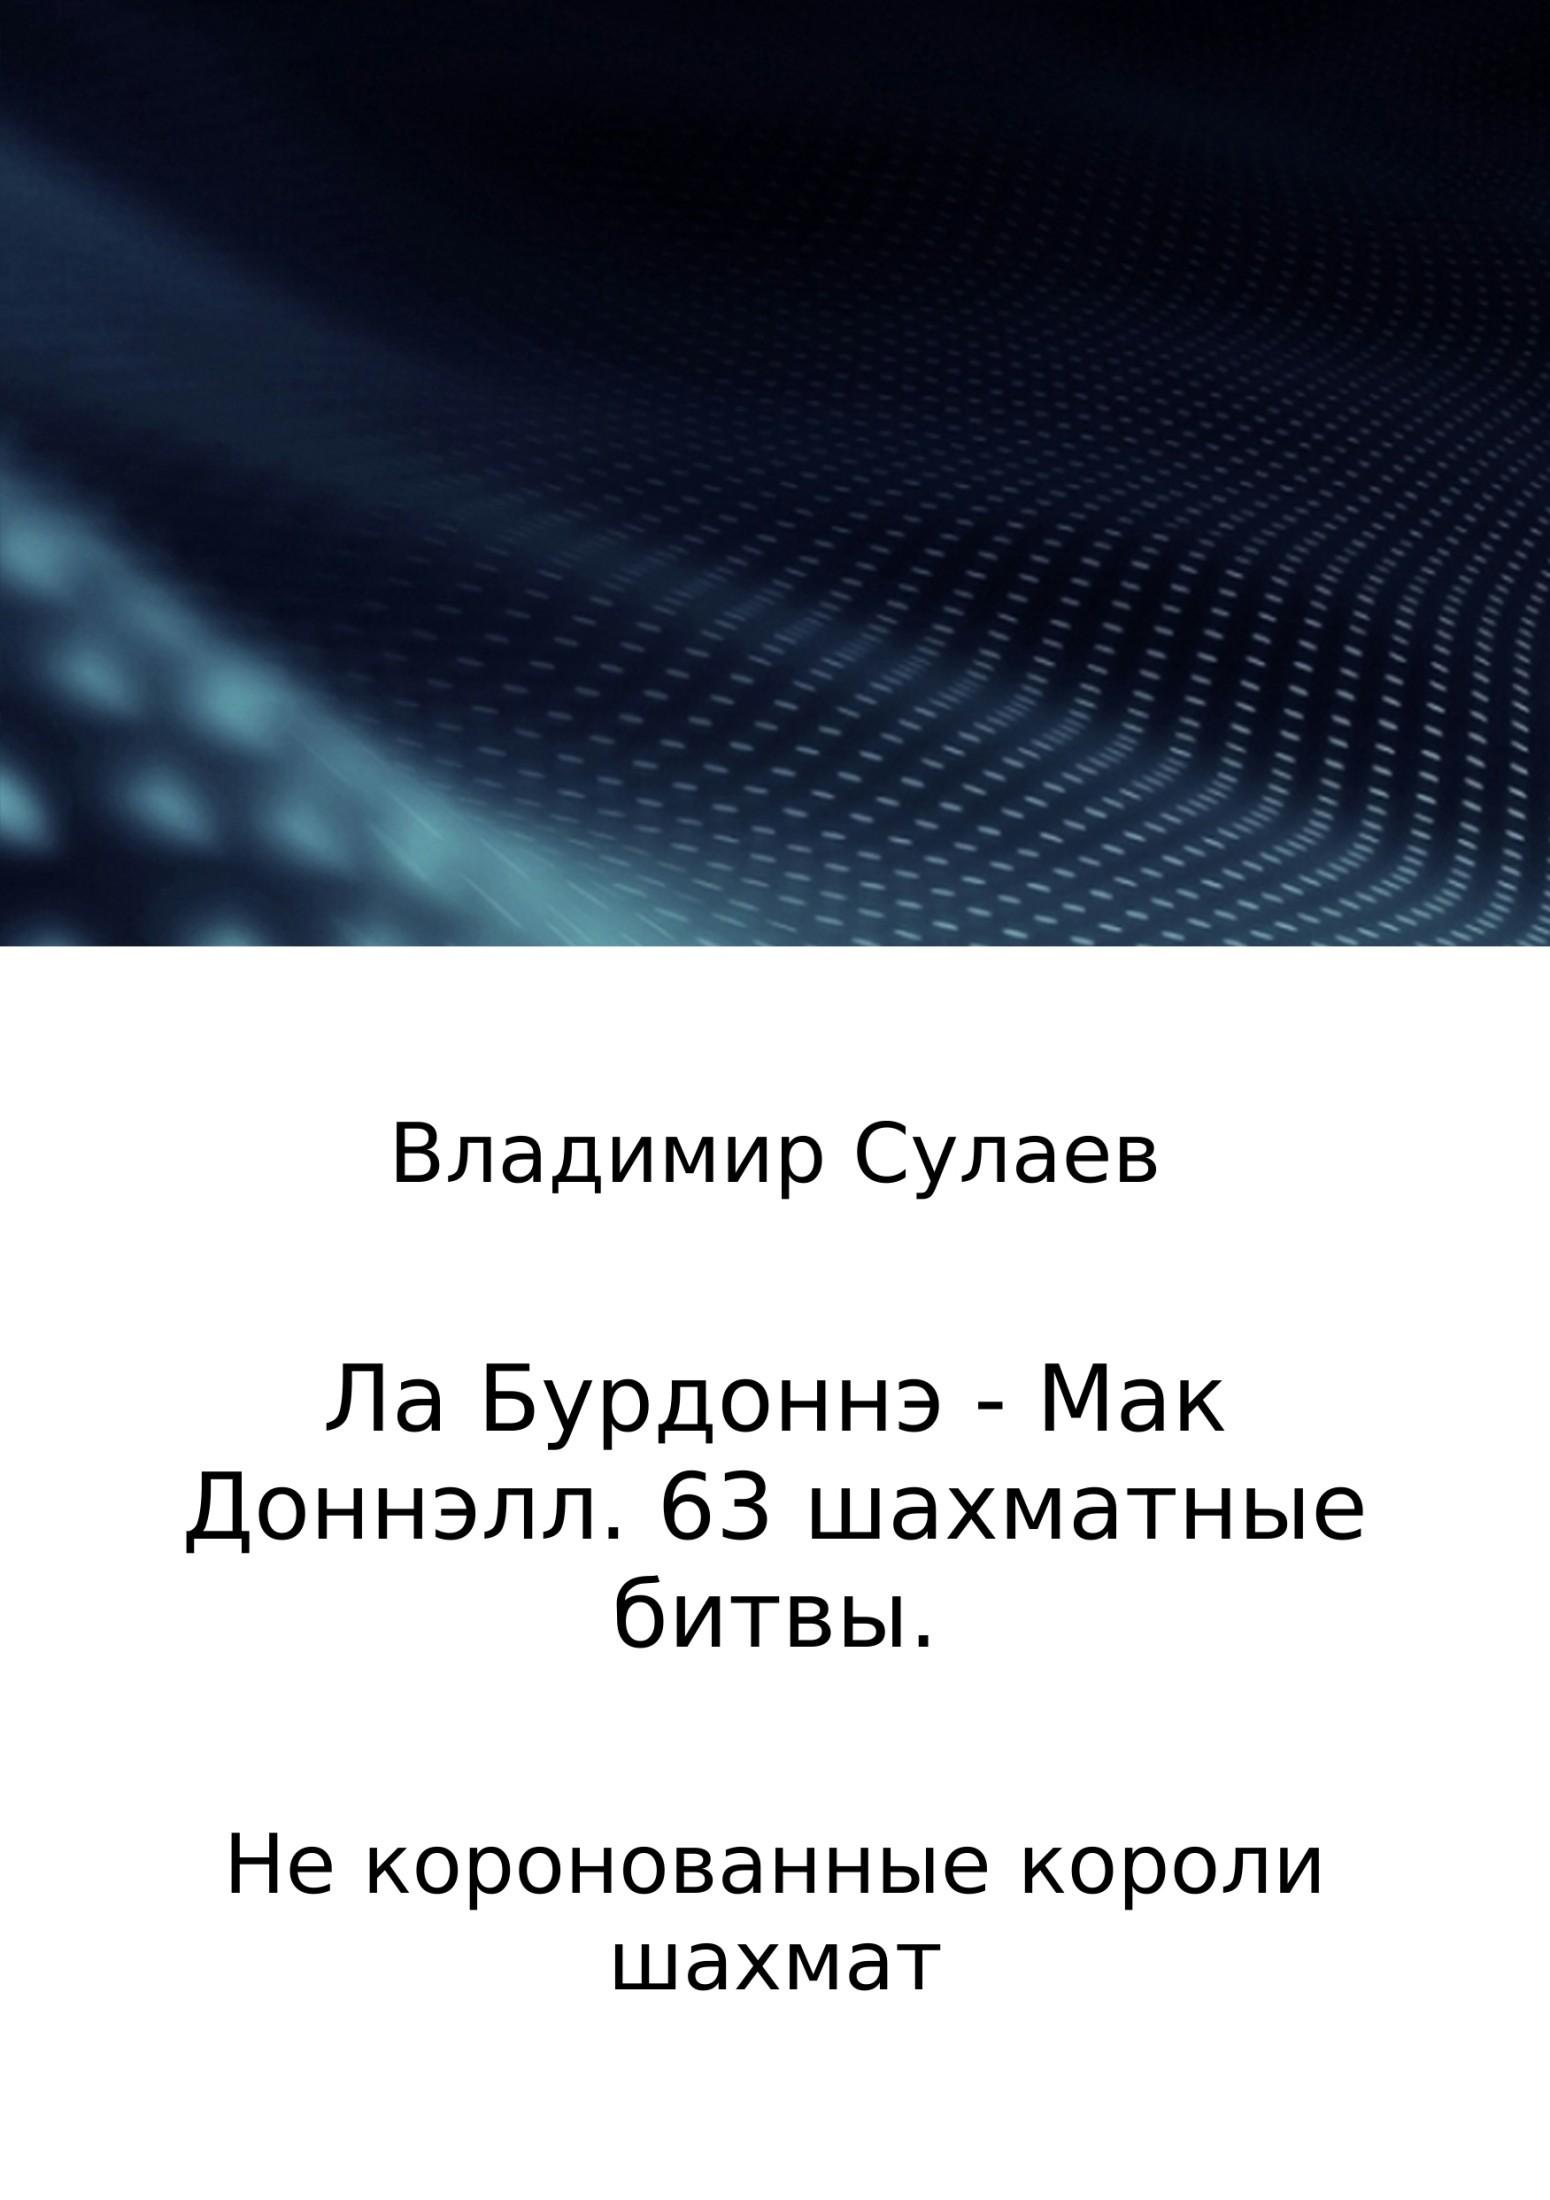 Владимир Валерьевич Сулаев Ла Бурдоннэ – Мак Доннэлл. 63 шахматные битвы владимир валерьевич сулаев ла бурдоннэ – мак доннэлл 63 шахматные битвы